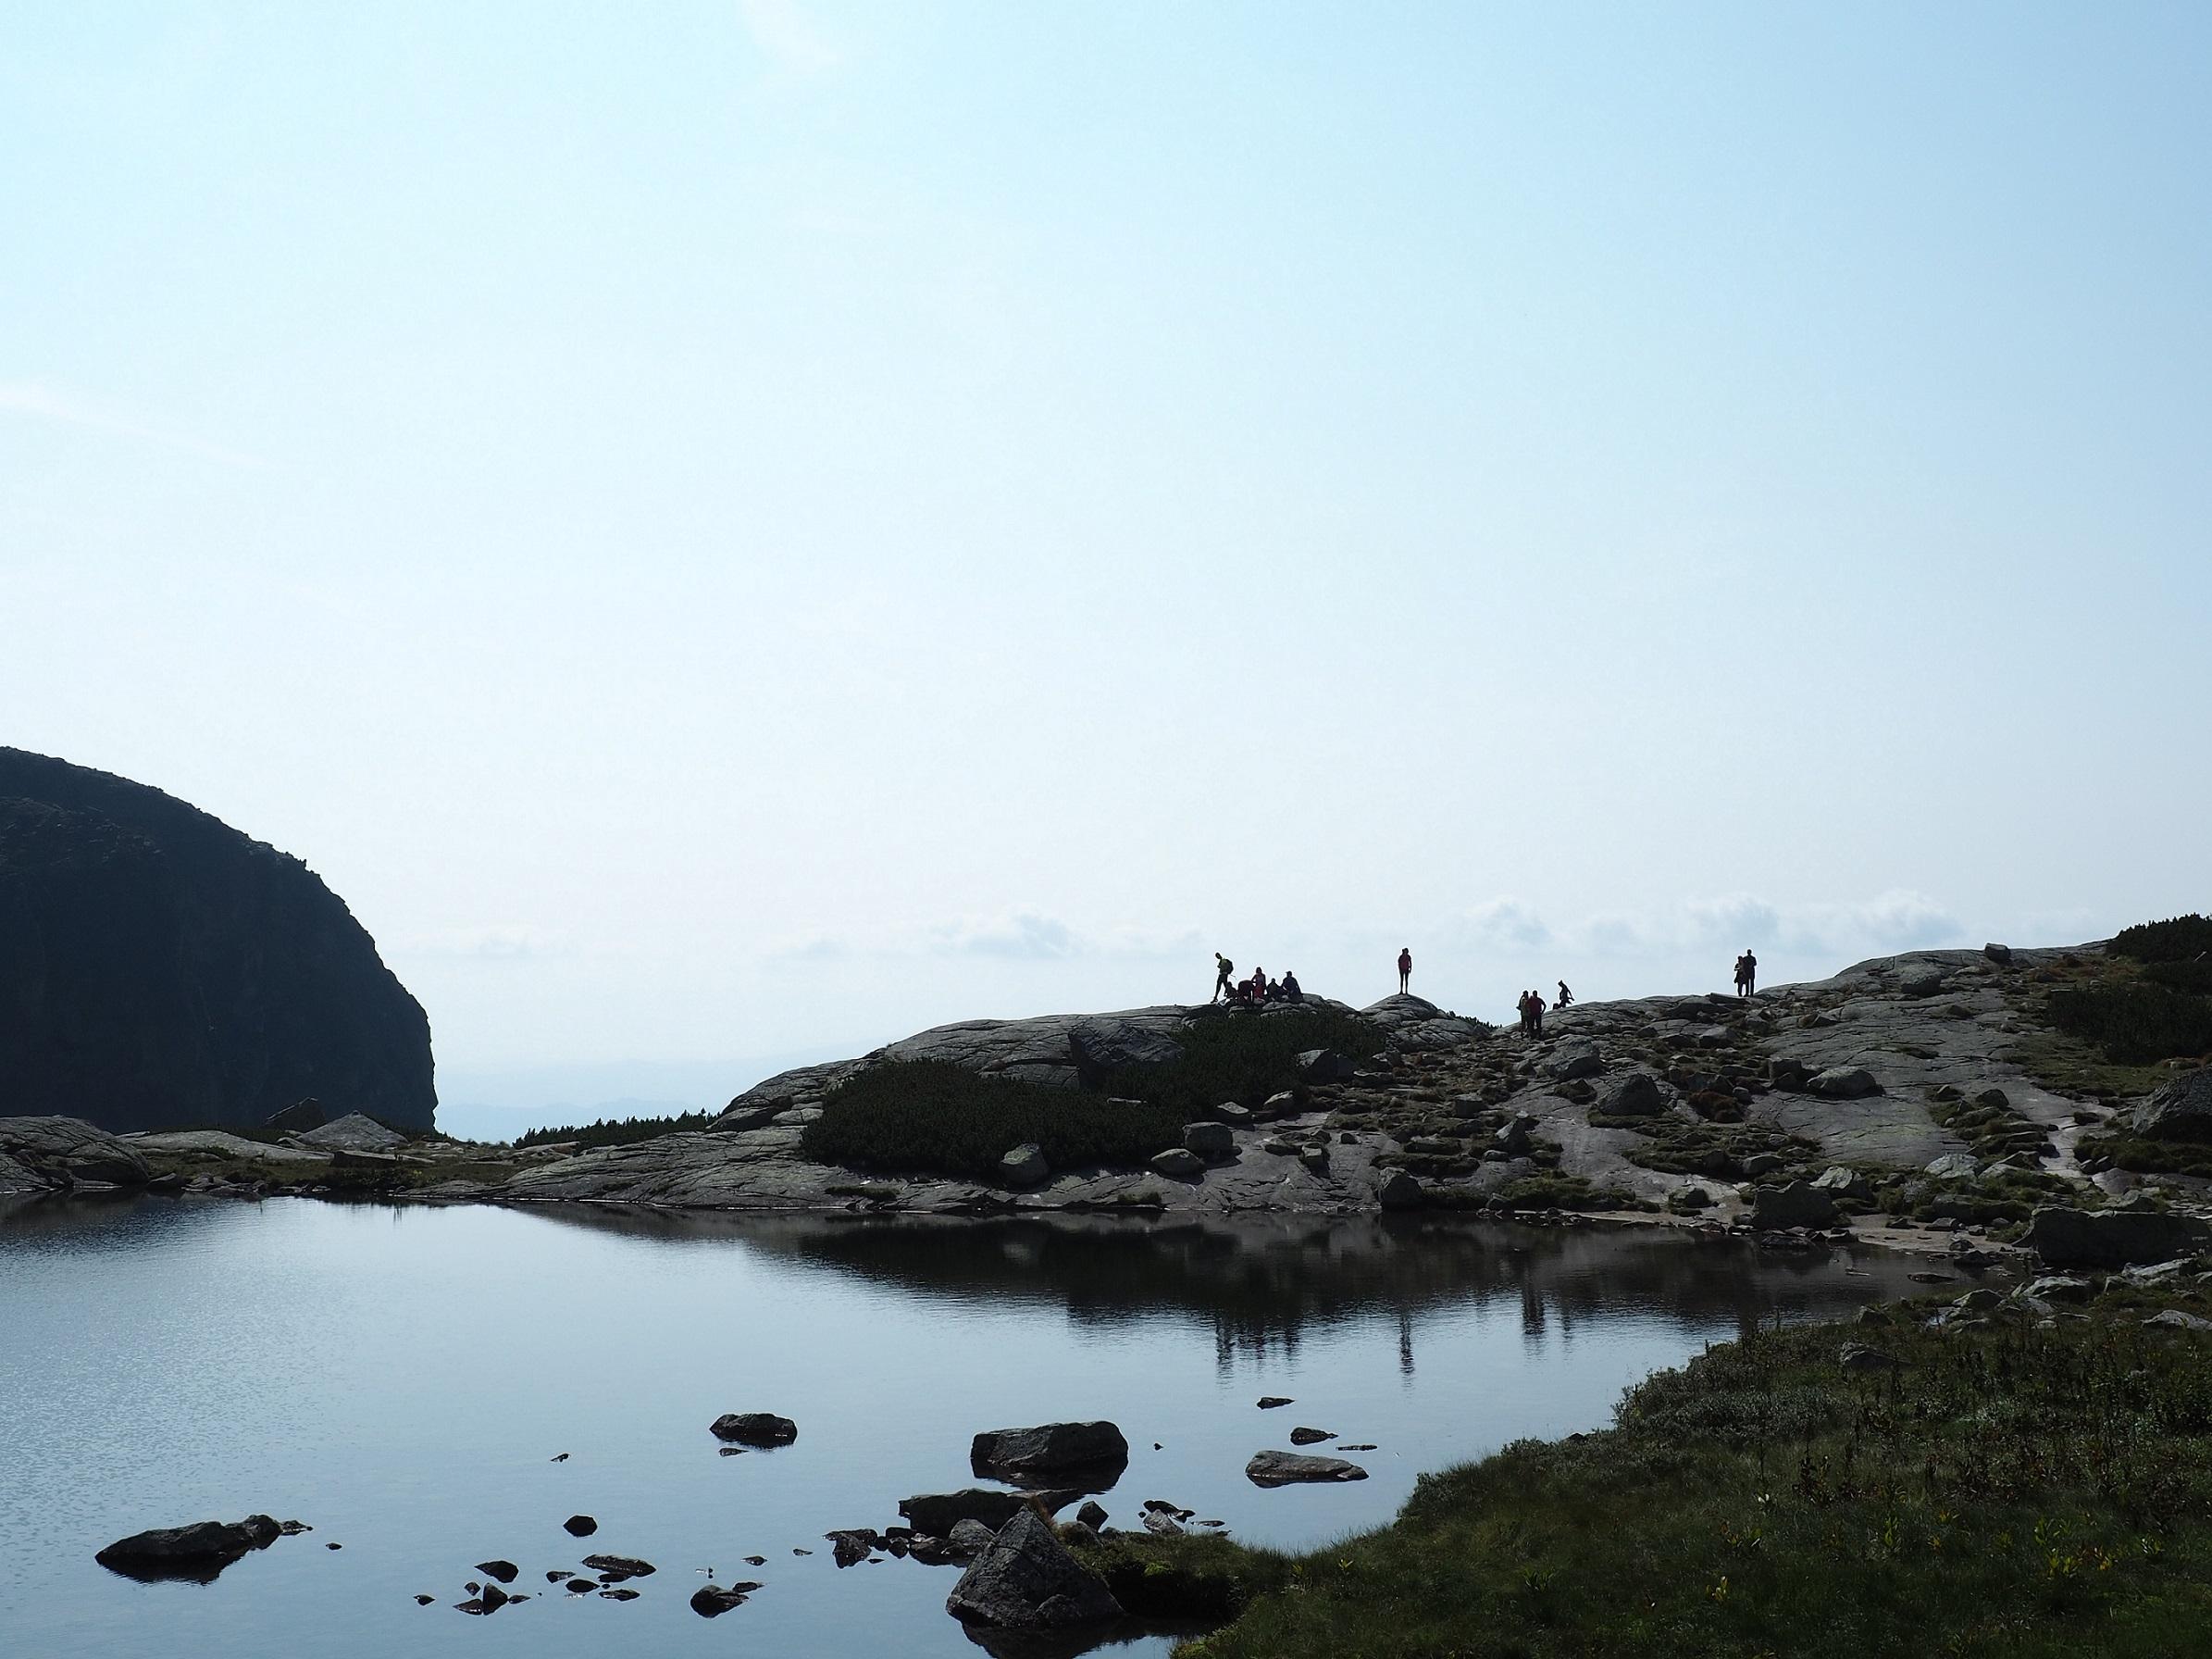 Randonnée dans les Tatras en Slovaquie